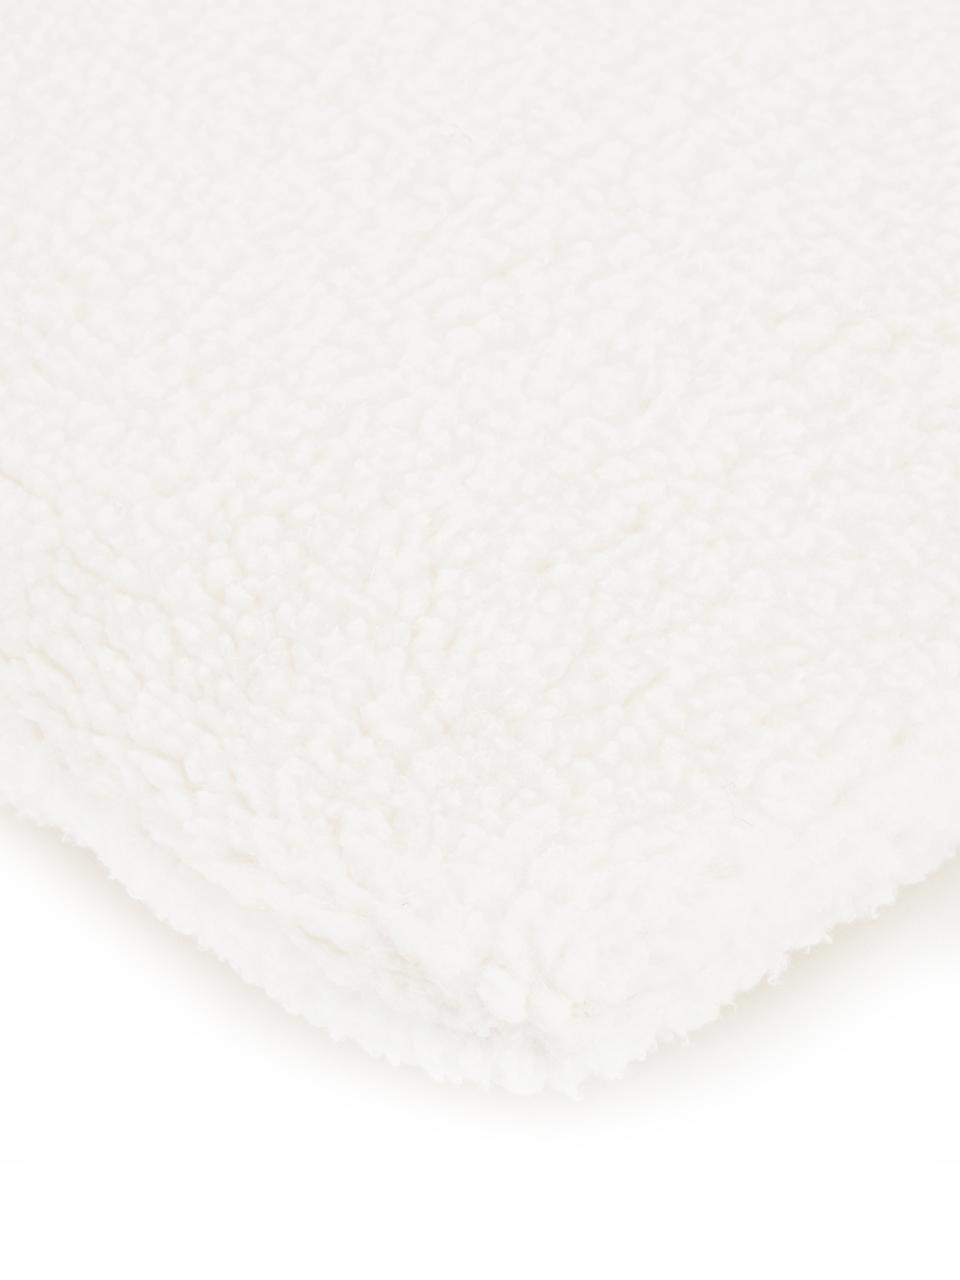 Flauschige Teddy-Kissenhülle Mille, Vorderseite: 100% Polyester (Teddyfell, Rückseite: 100% Polyester (Teddyfell, Creme, 45 x 45 cm